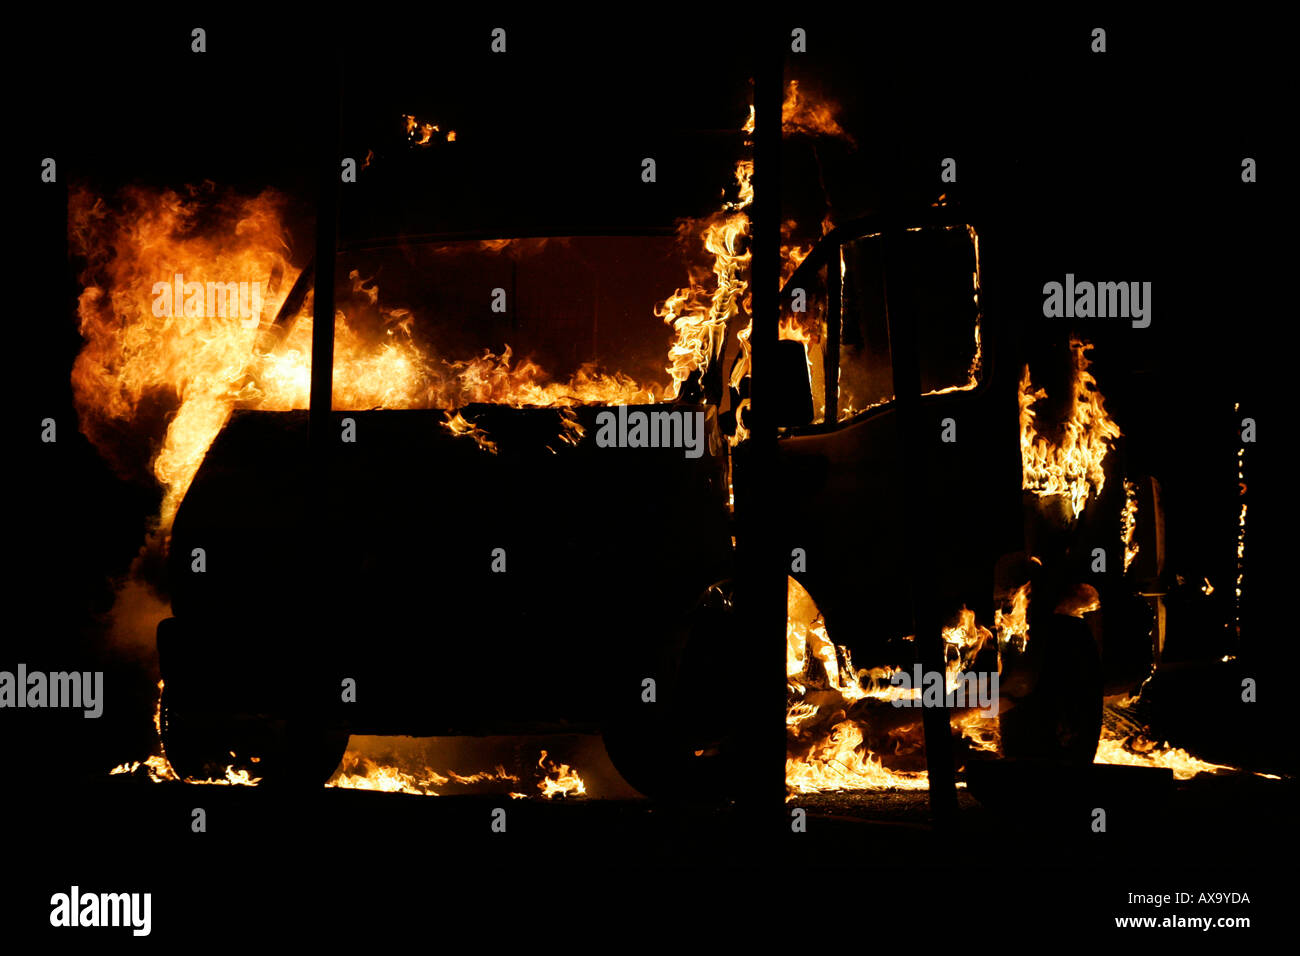 Van burning as roadblock during loyalist rioting and violence north belfast northern ireland - Stock Image